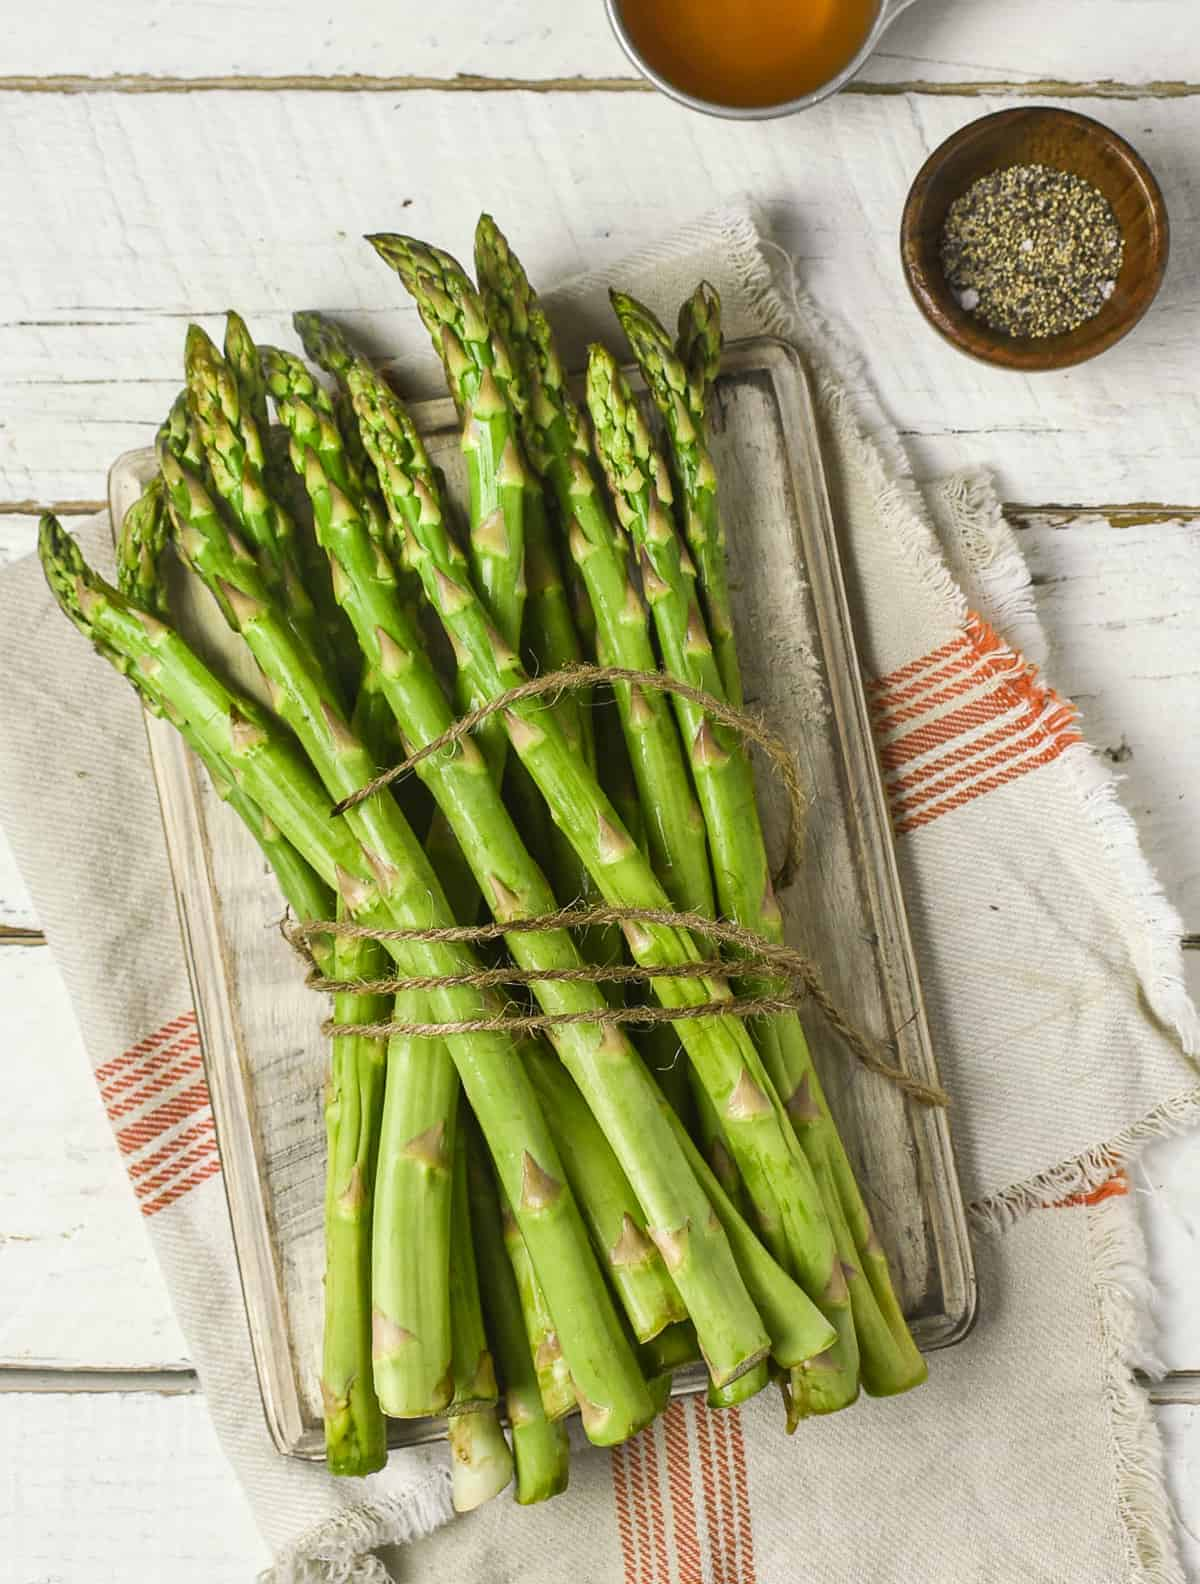 Raw asparagus in twine.